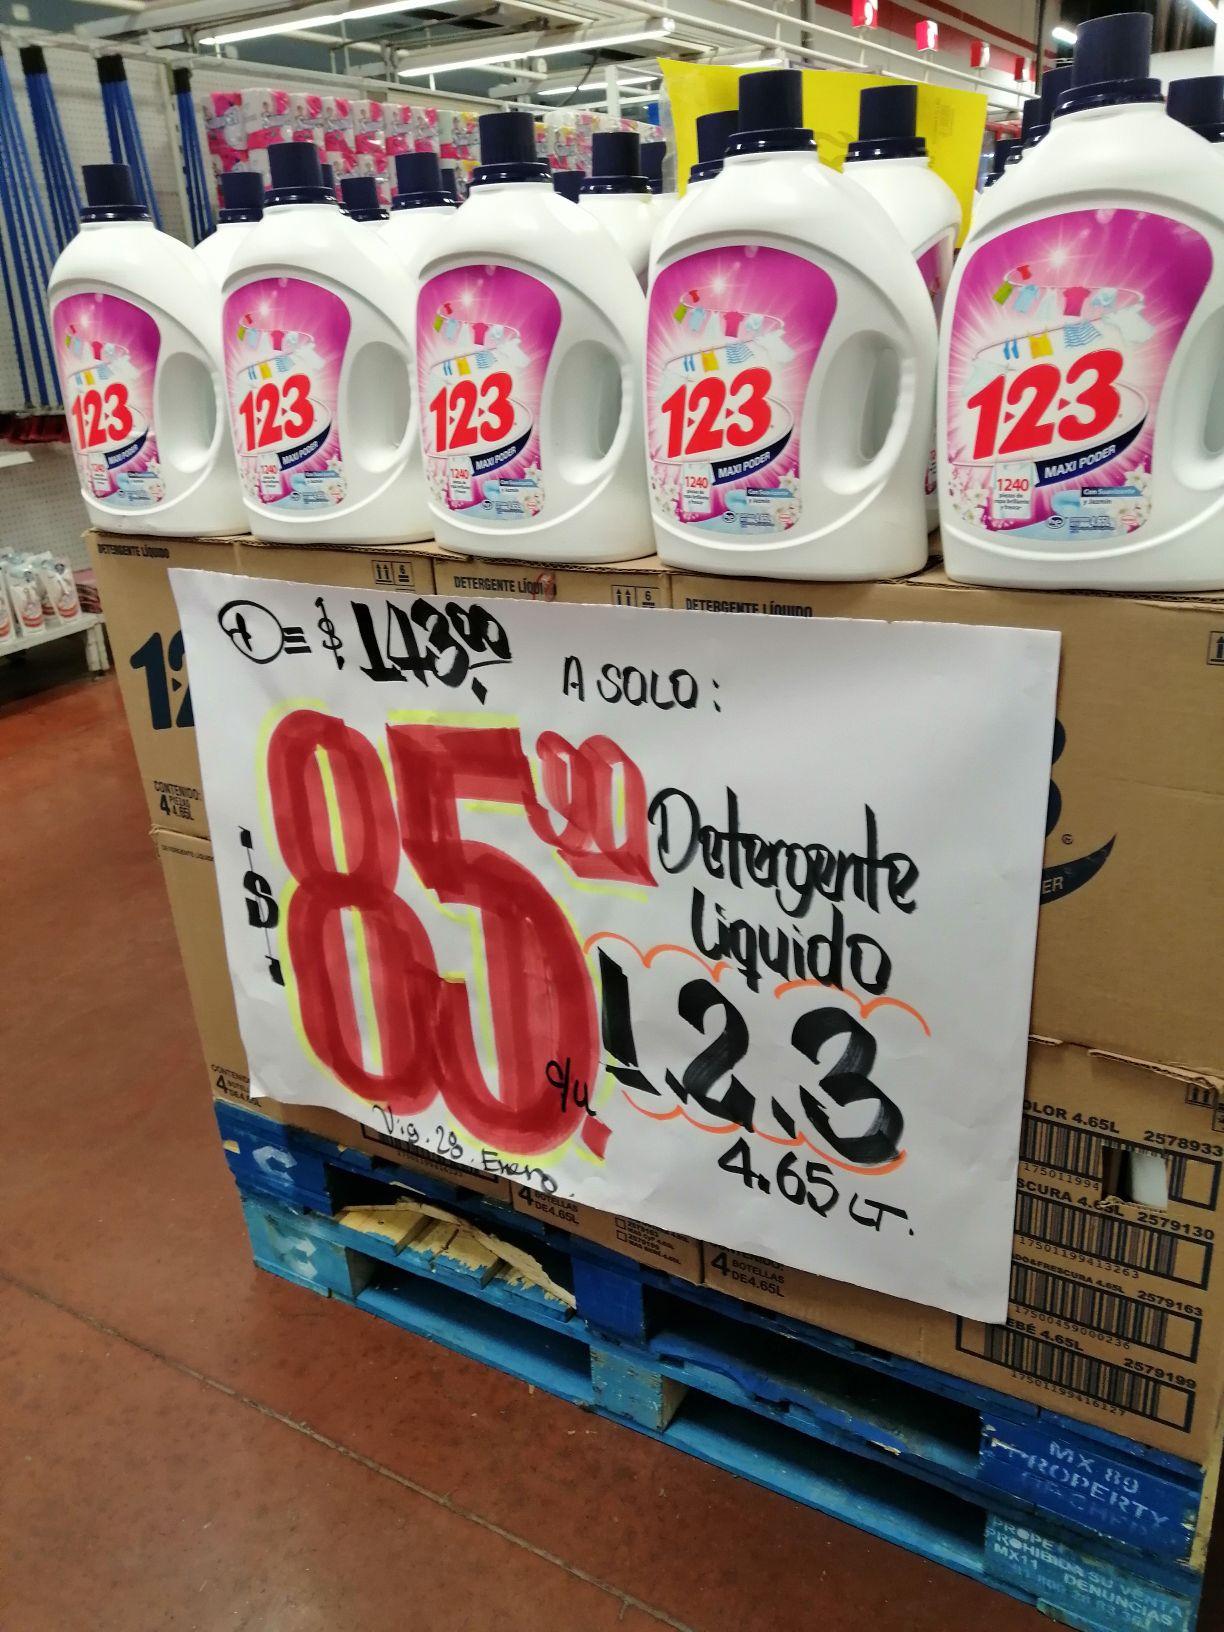 Soriana Mercado Maxiplaza: Detergente líquido 1-2-3 4.5 LT